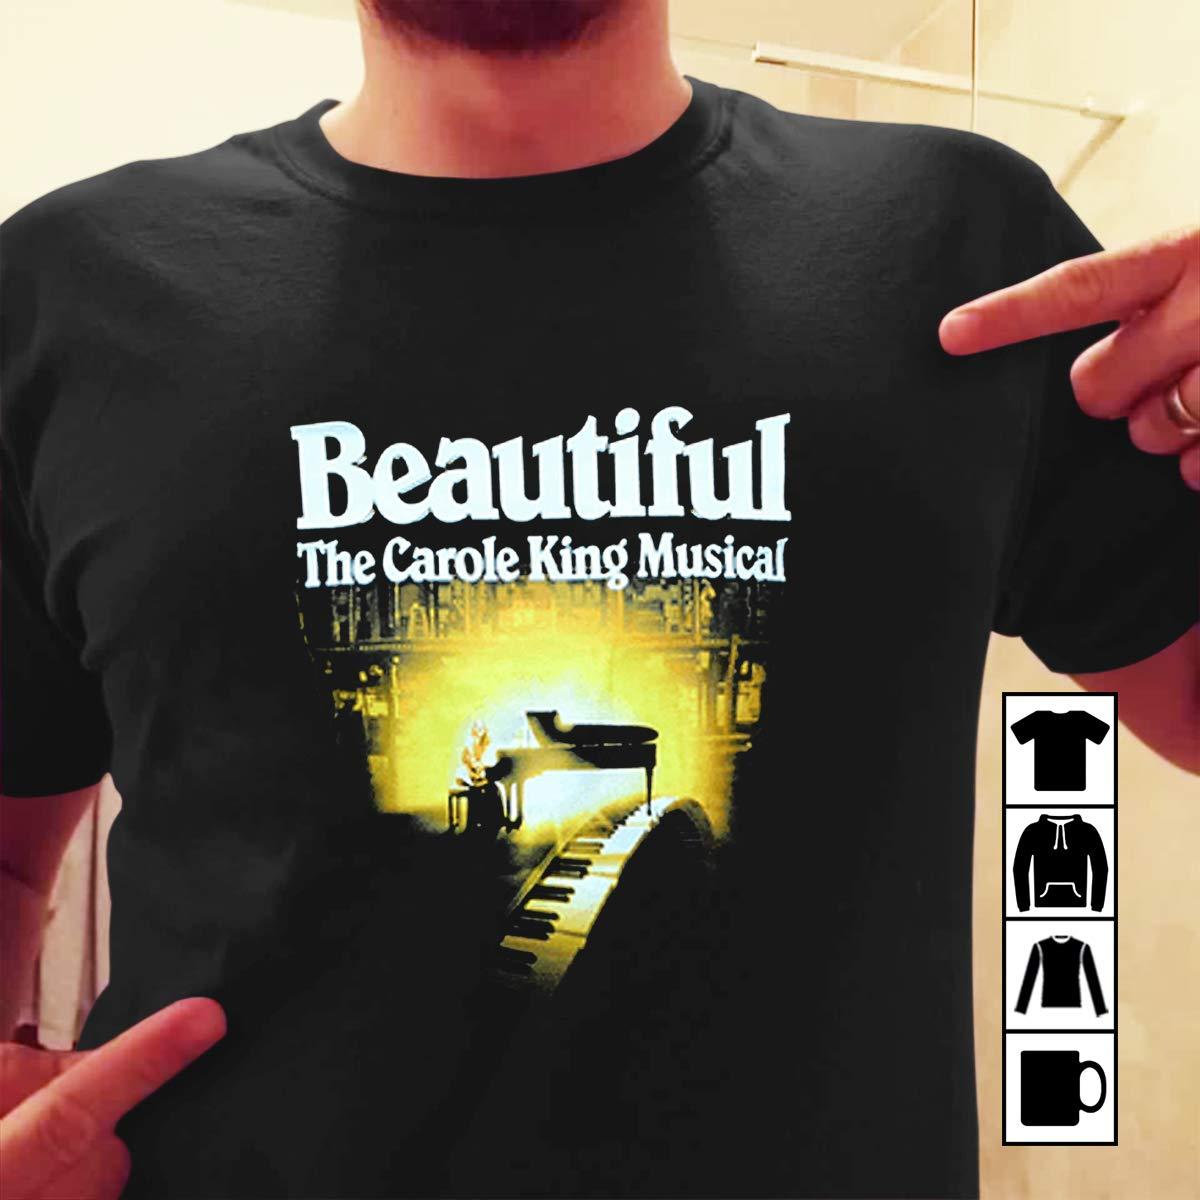 Beautiful The Carole King Music Tshirt Beautiful The Carole King Music Tshirt